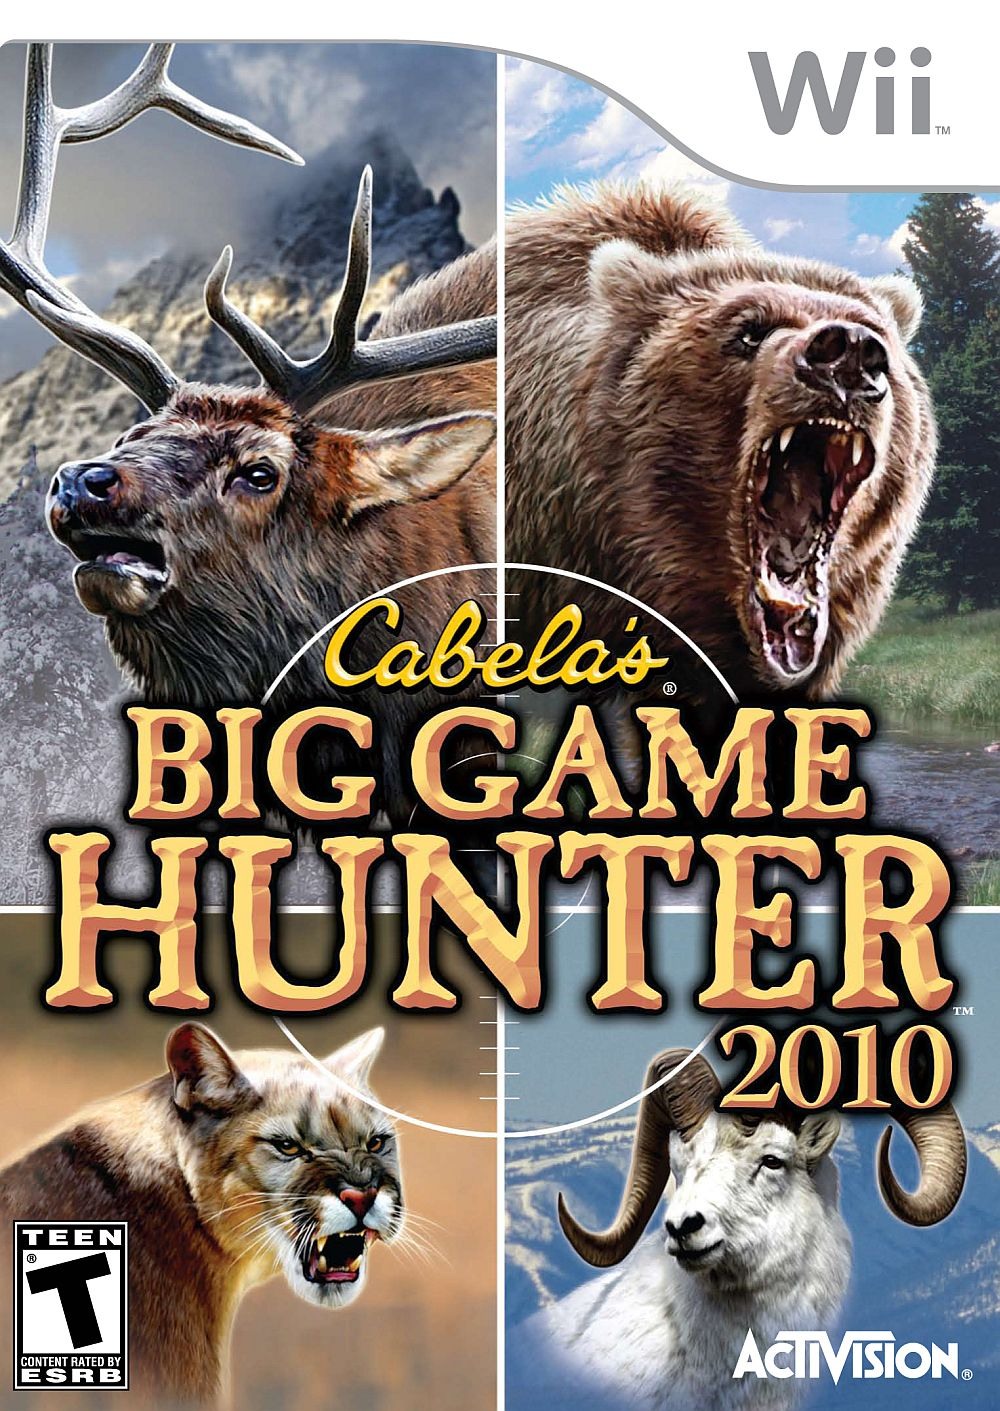 Cabela's Big Game Hunter 2010 Nintendo WII Game